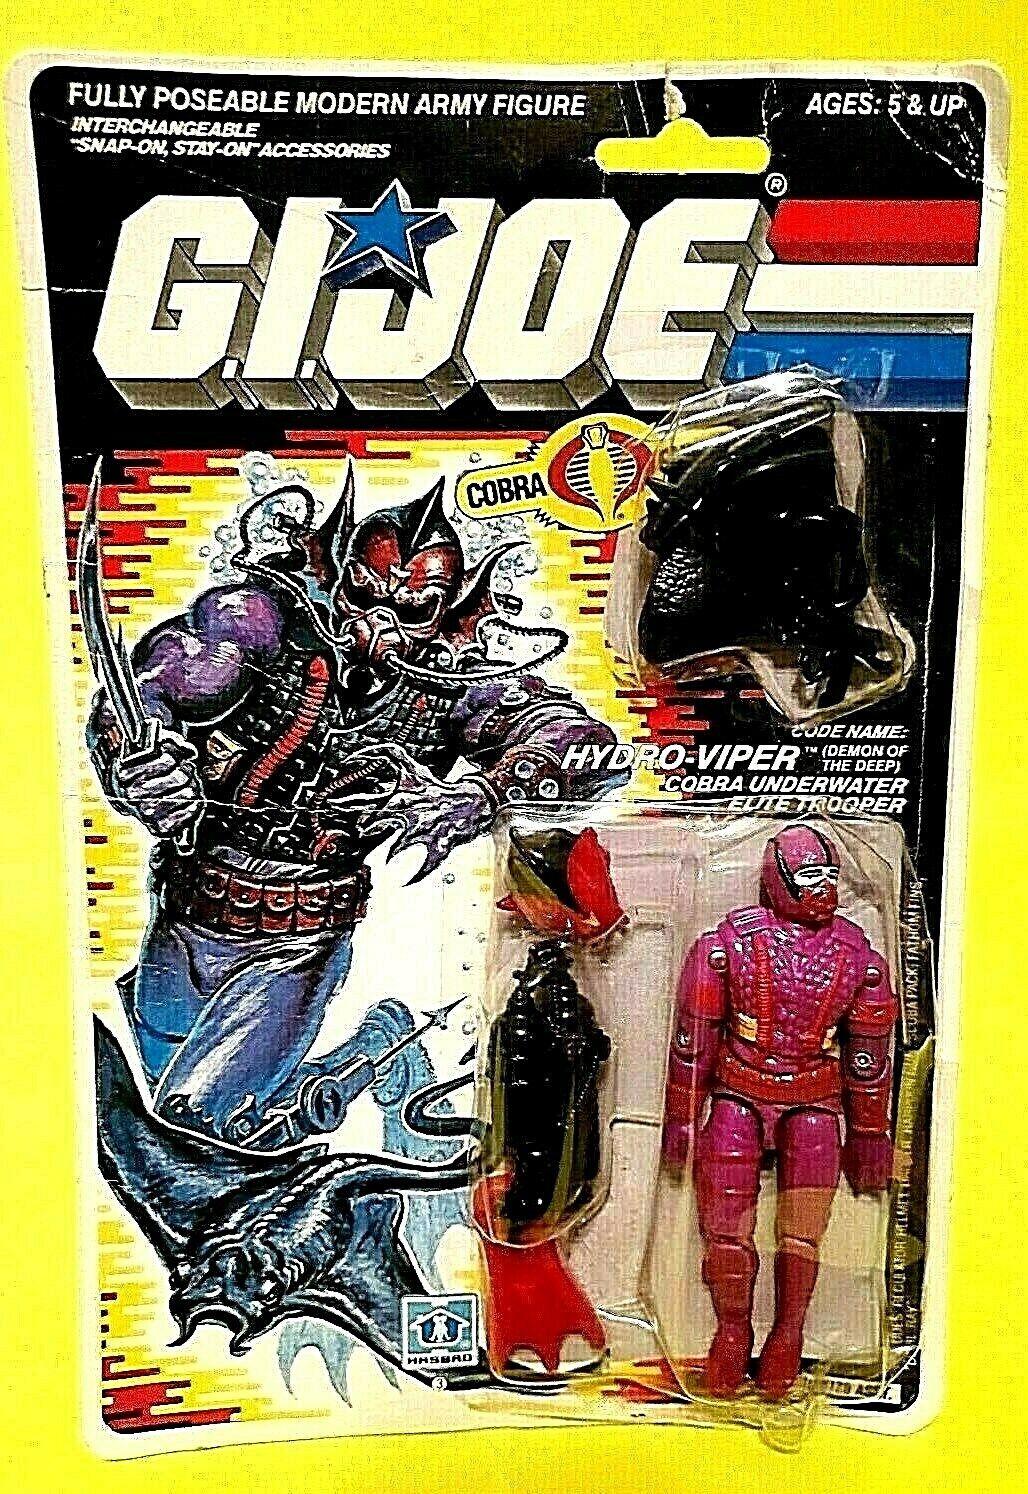 Vintage GI JOE HYDRO-VIPER Action Figure Cobra Trooper ARAH 1988 w Weapons Lot